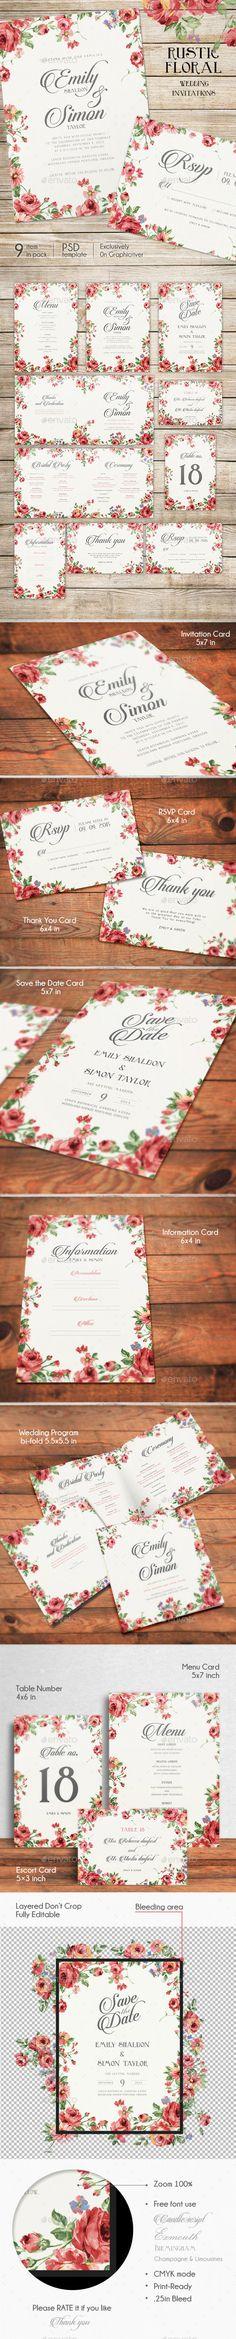 Rustic Floral Wedding Invitations Template. Download: http://graphicriver.net/item/rustic-floral-wedding-invitations/10358801?ref=ksioks